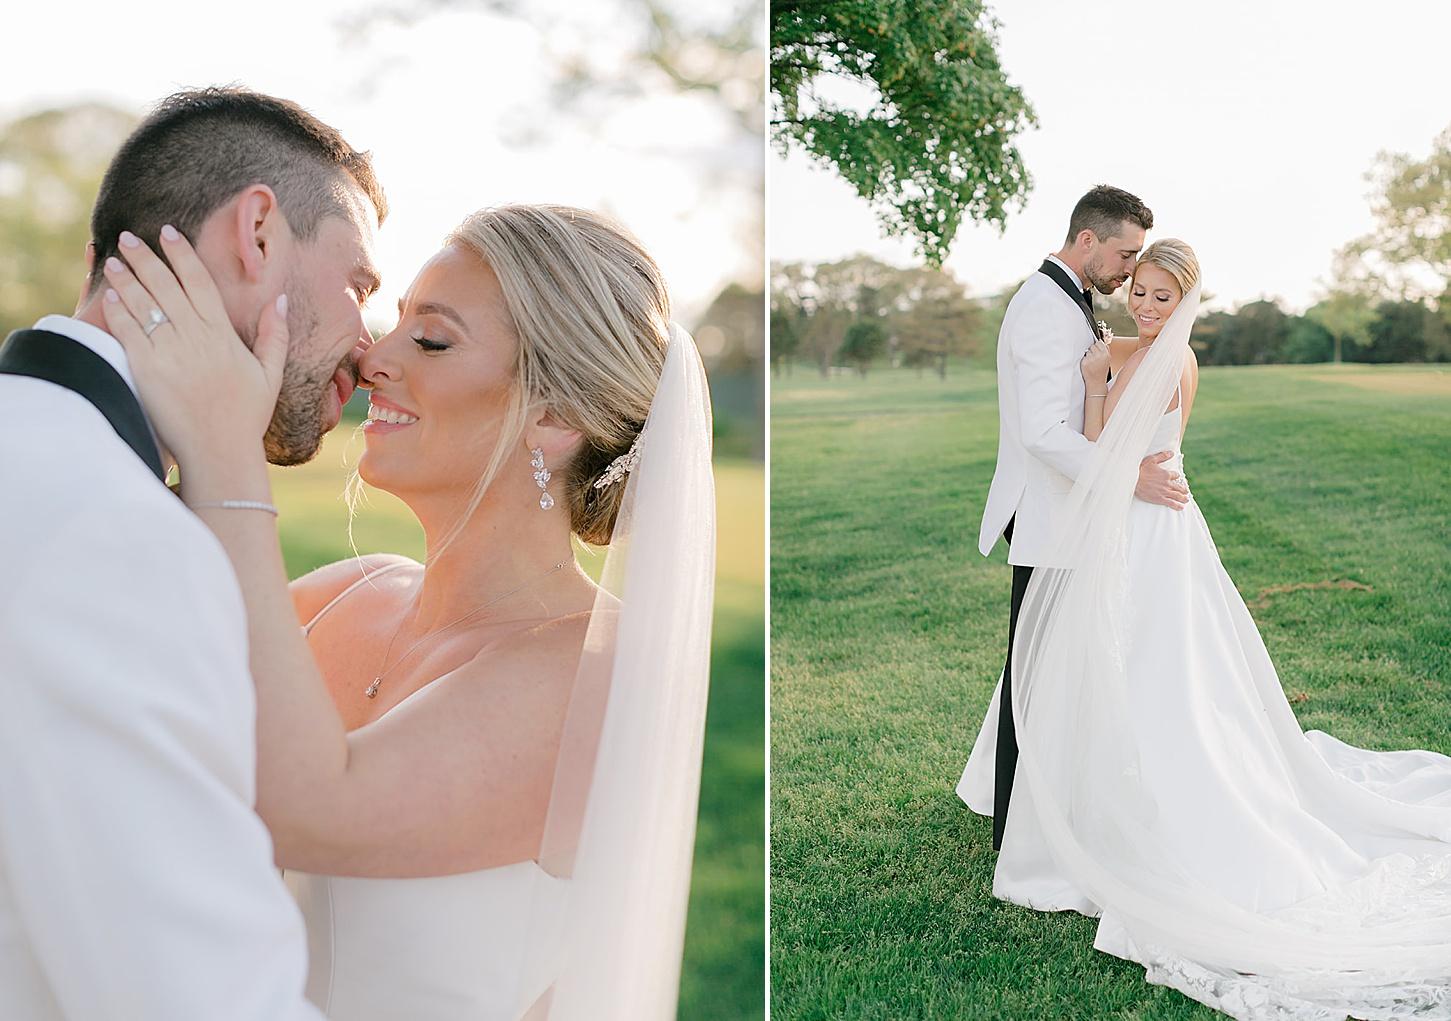 Linwood Country Club Summer Wedding Photography Studio by Magdalena Studios Jenn Kyle 0047